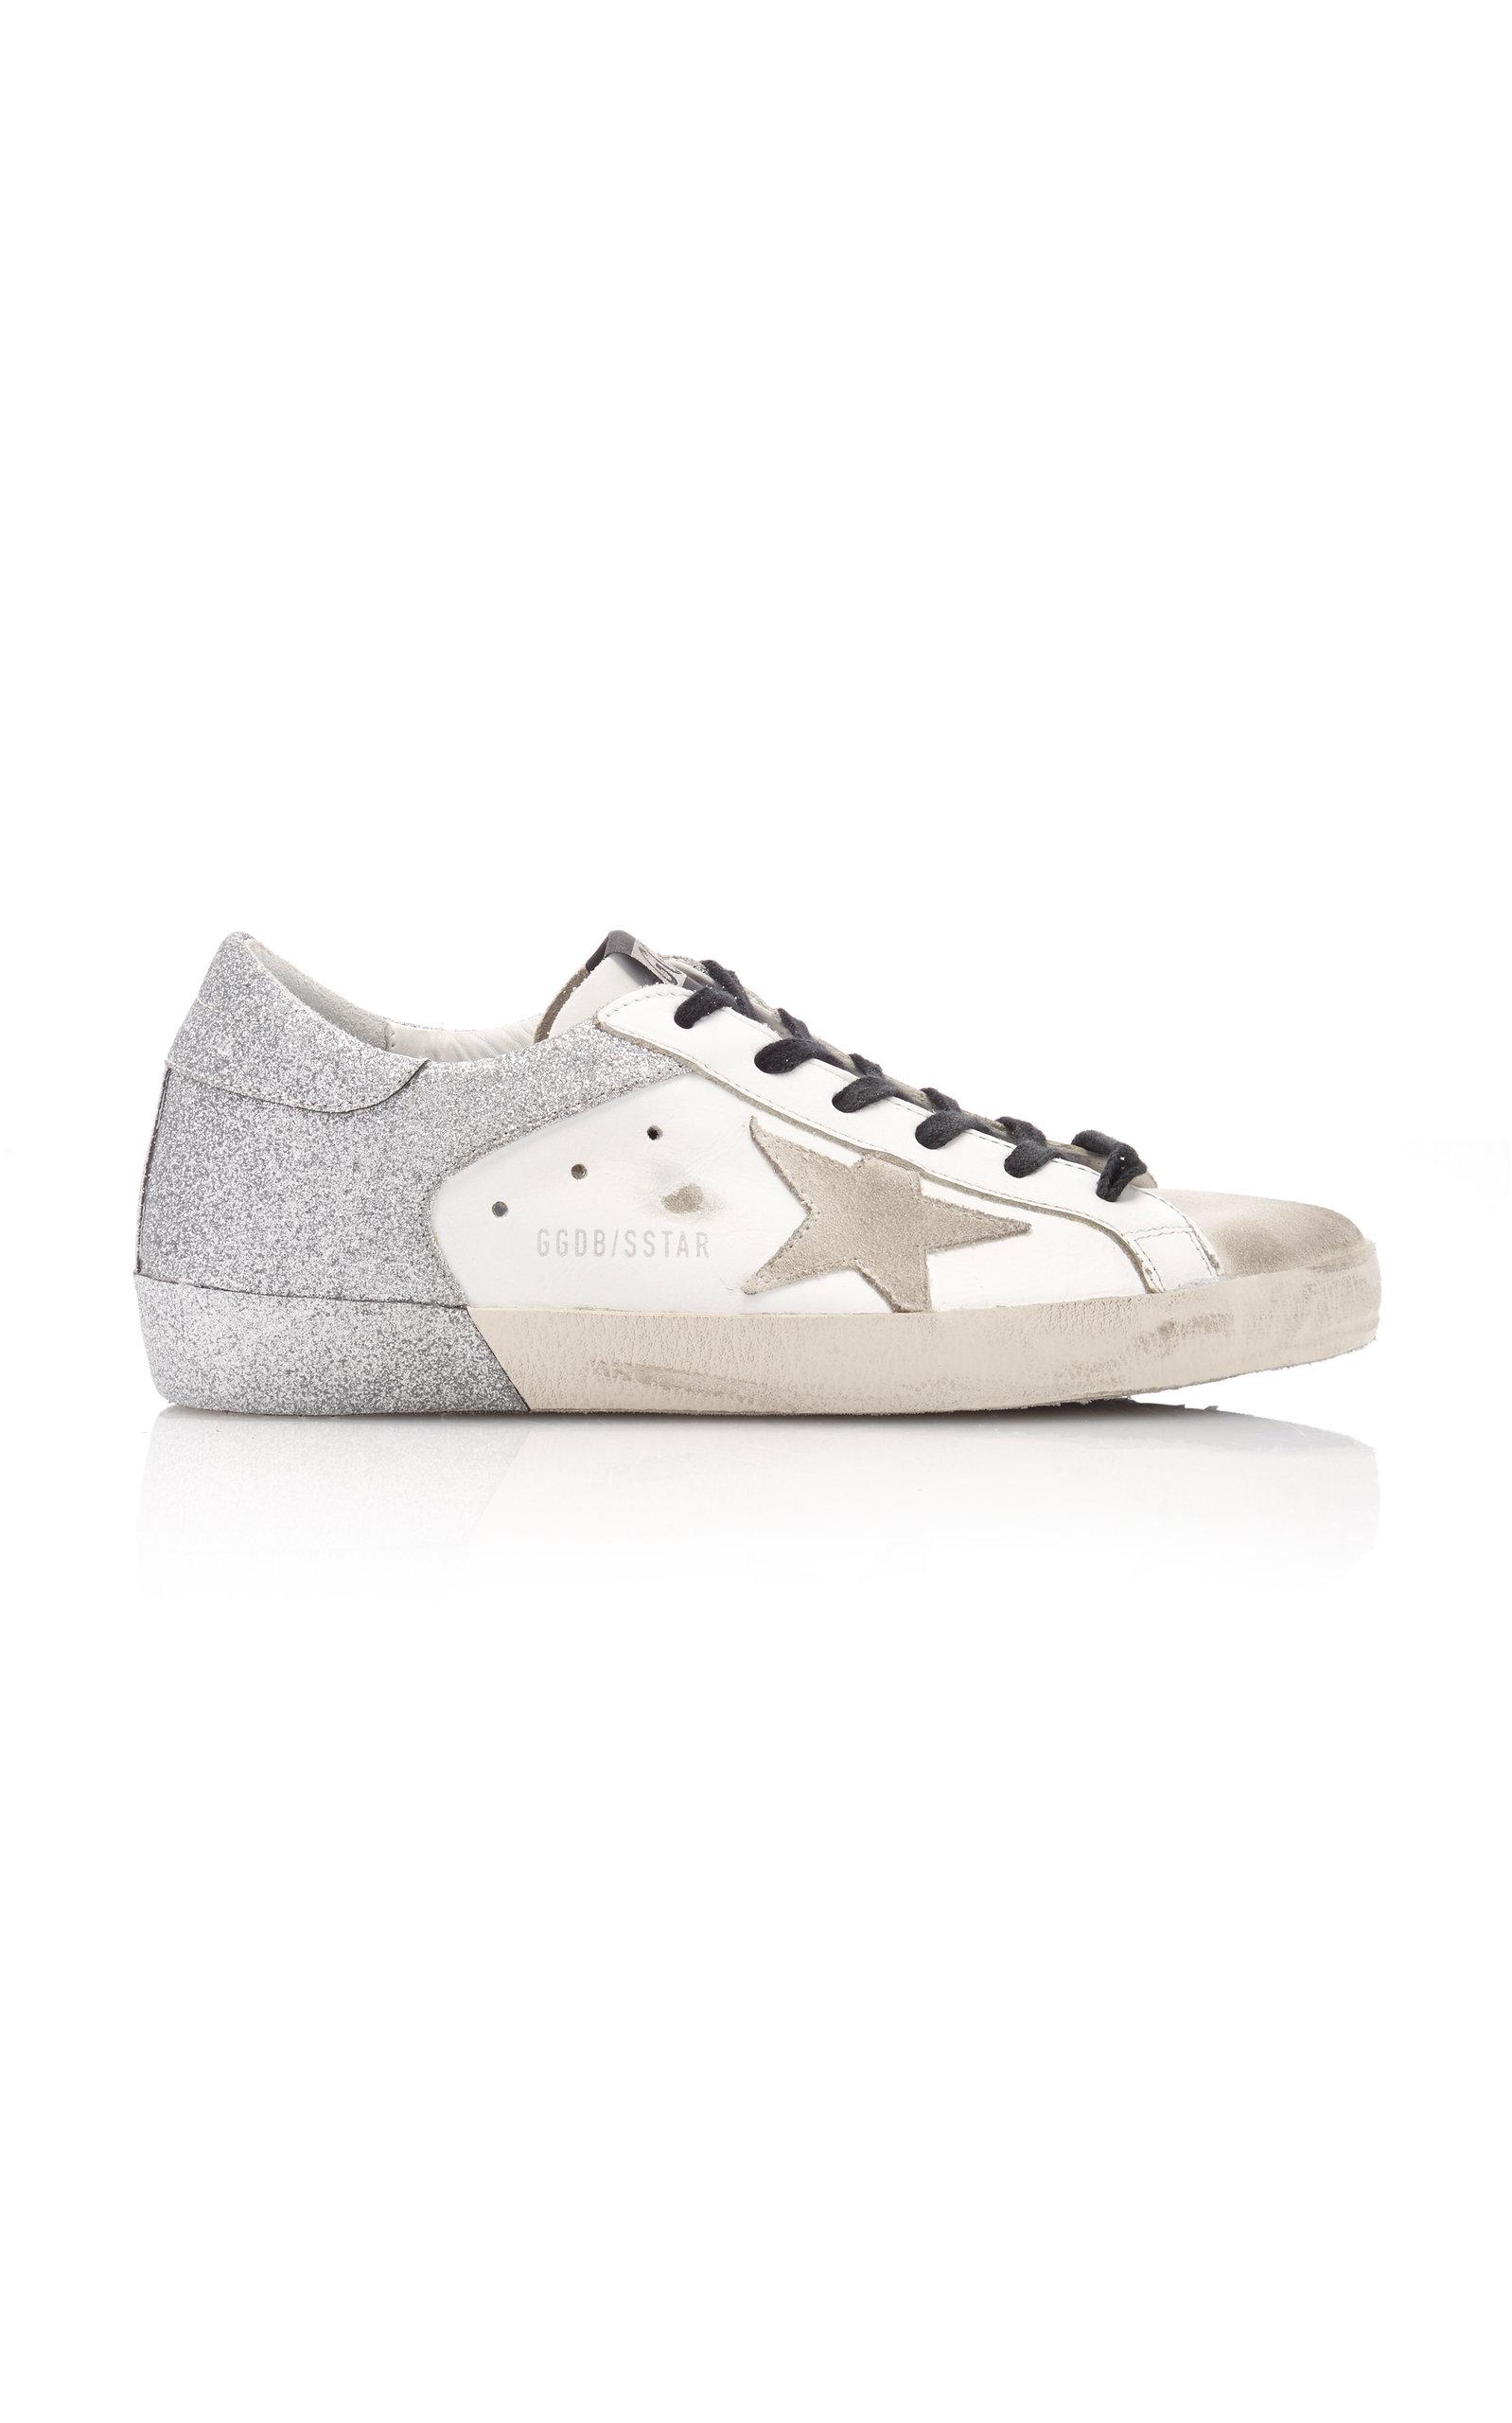 Golden Goose - Women's Superstar Low-Top Leather Sneakers - Multi - Moda Operandi